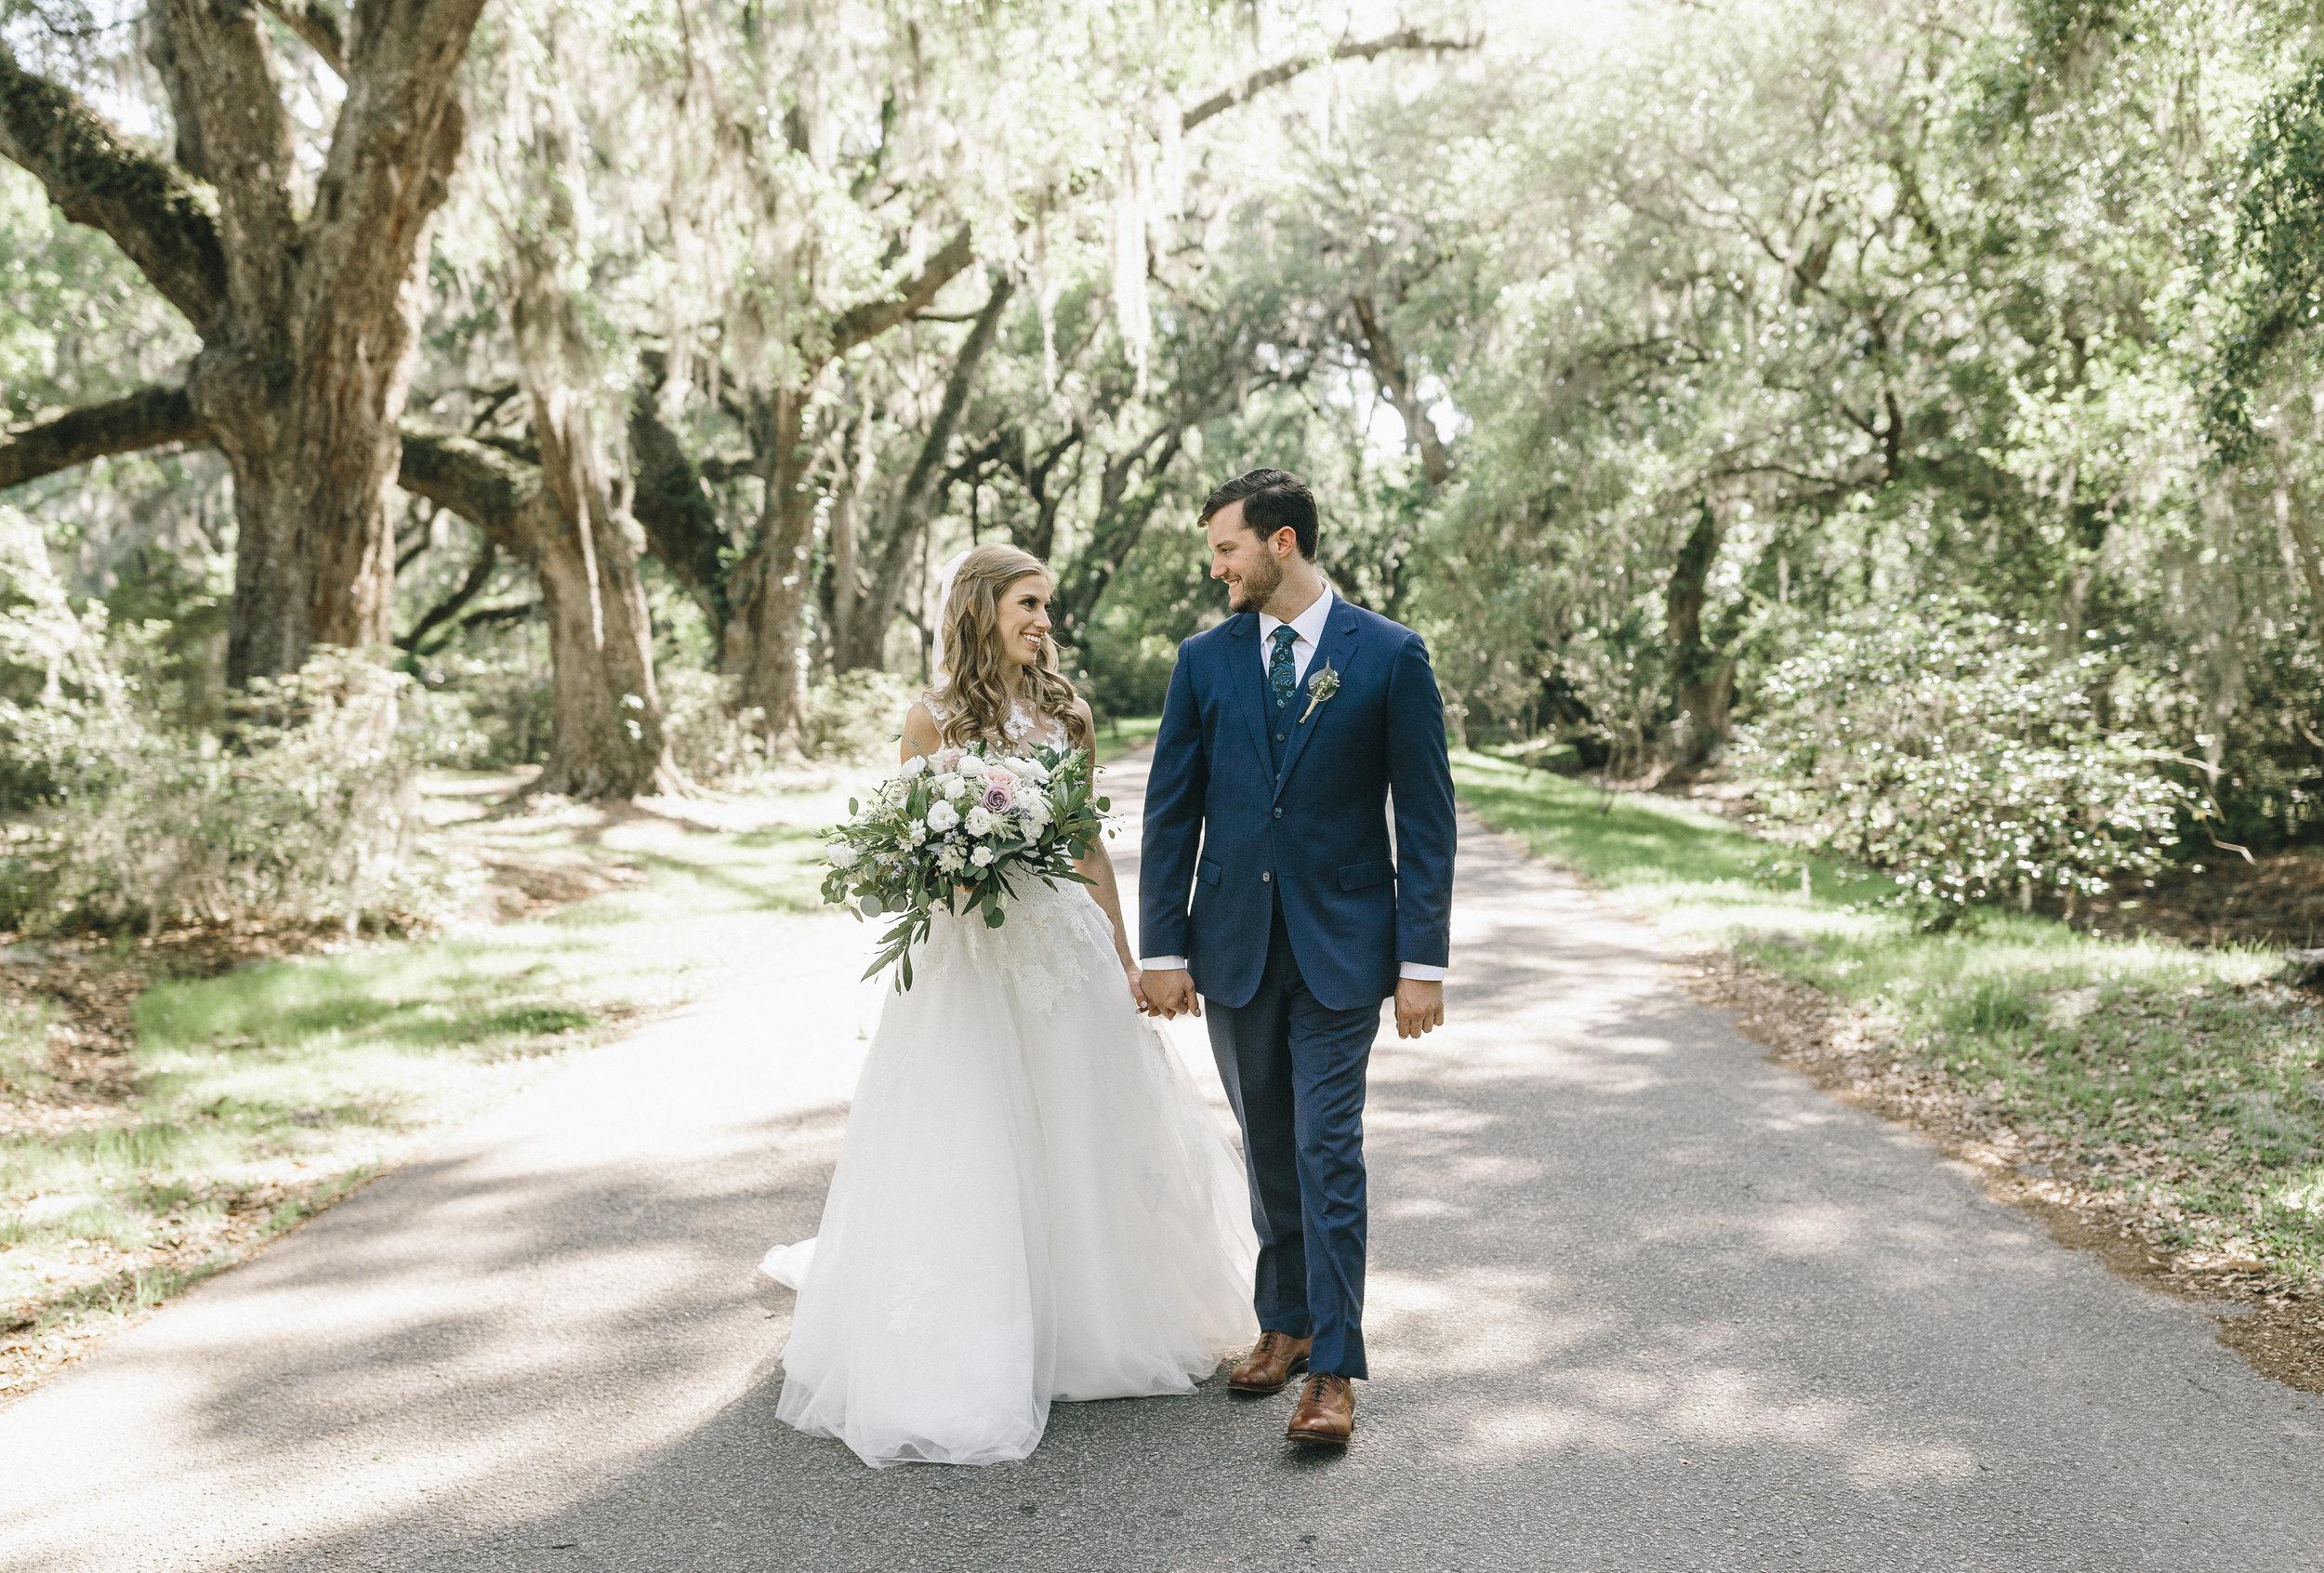 Jenna+Michael_wedding-232.jpg